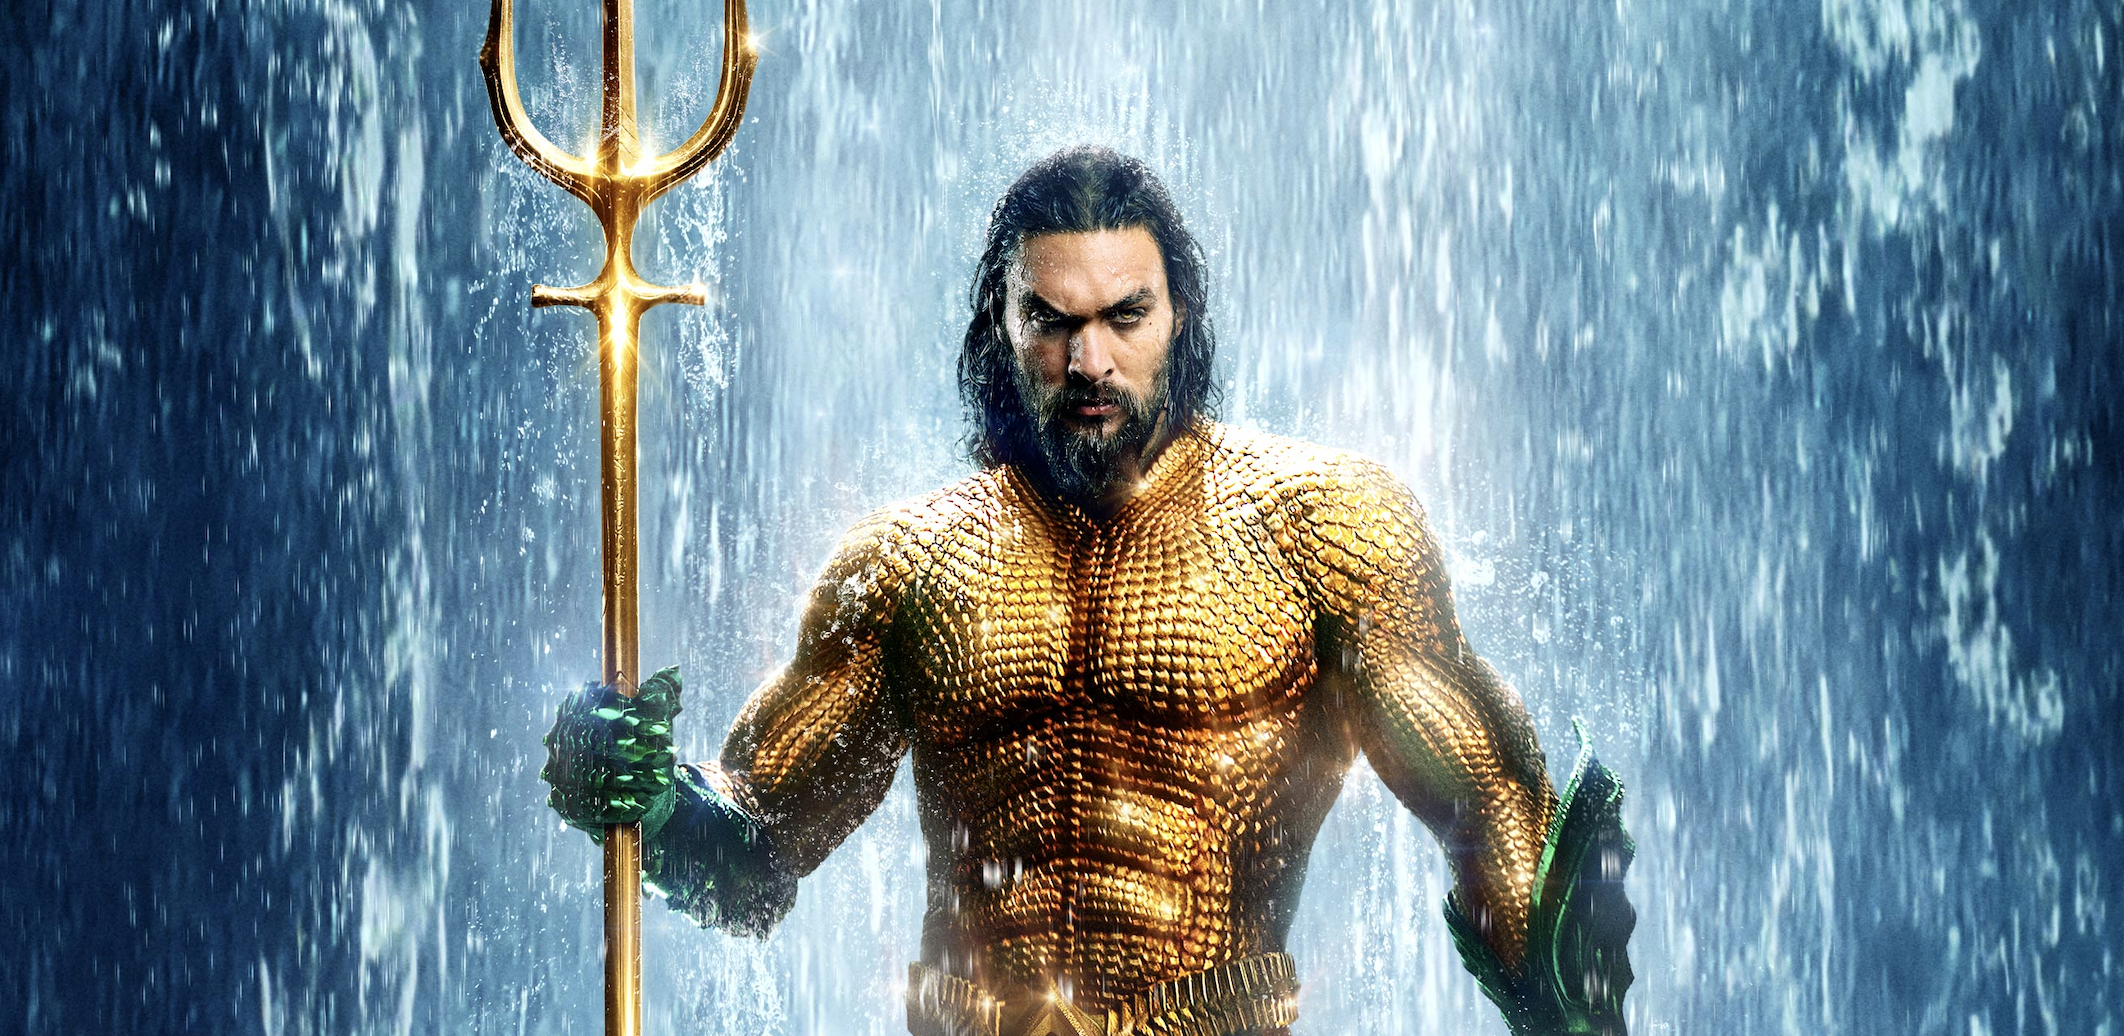 Jason Momoa as Aquaman, Image via Warner Bros.